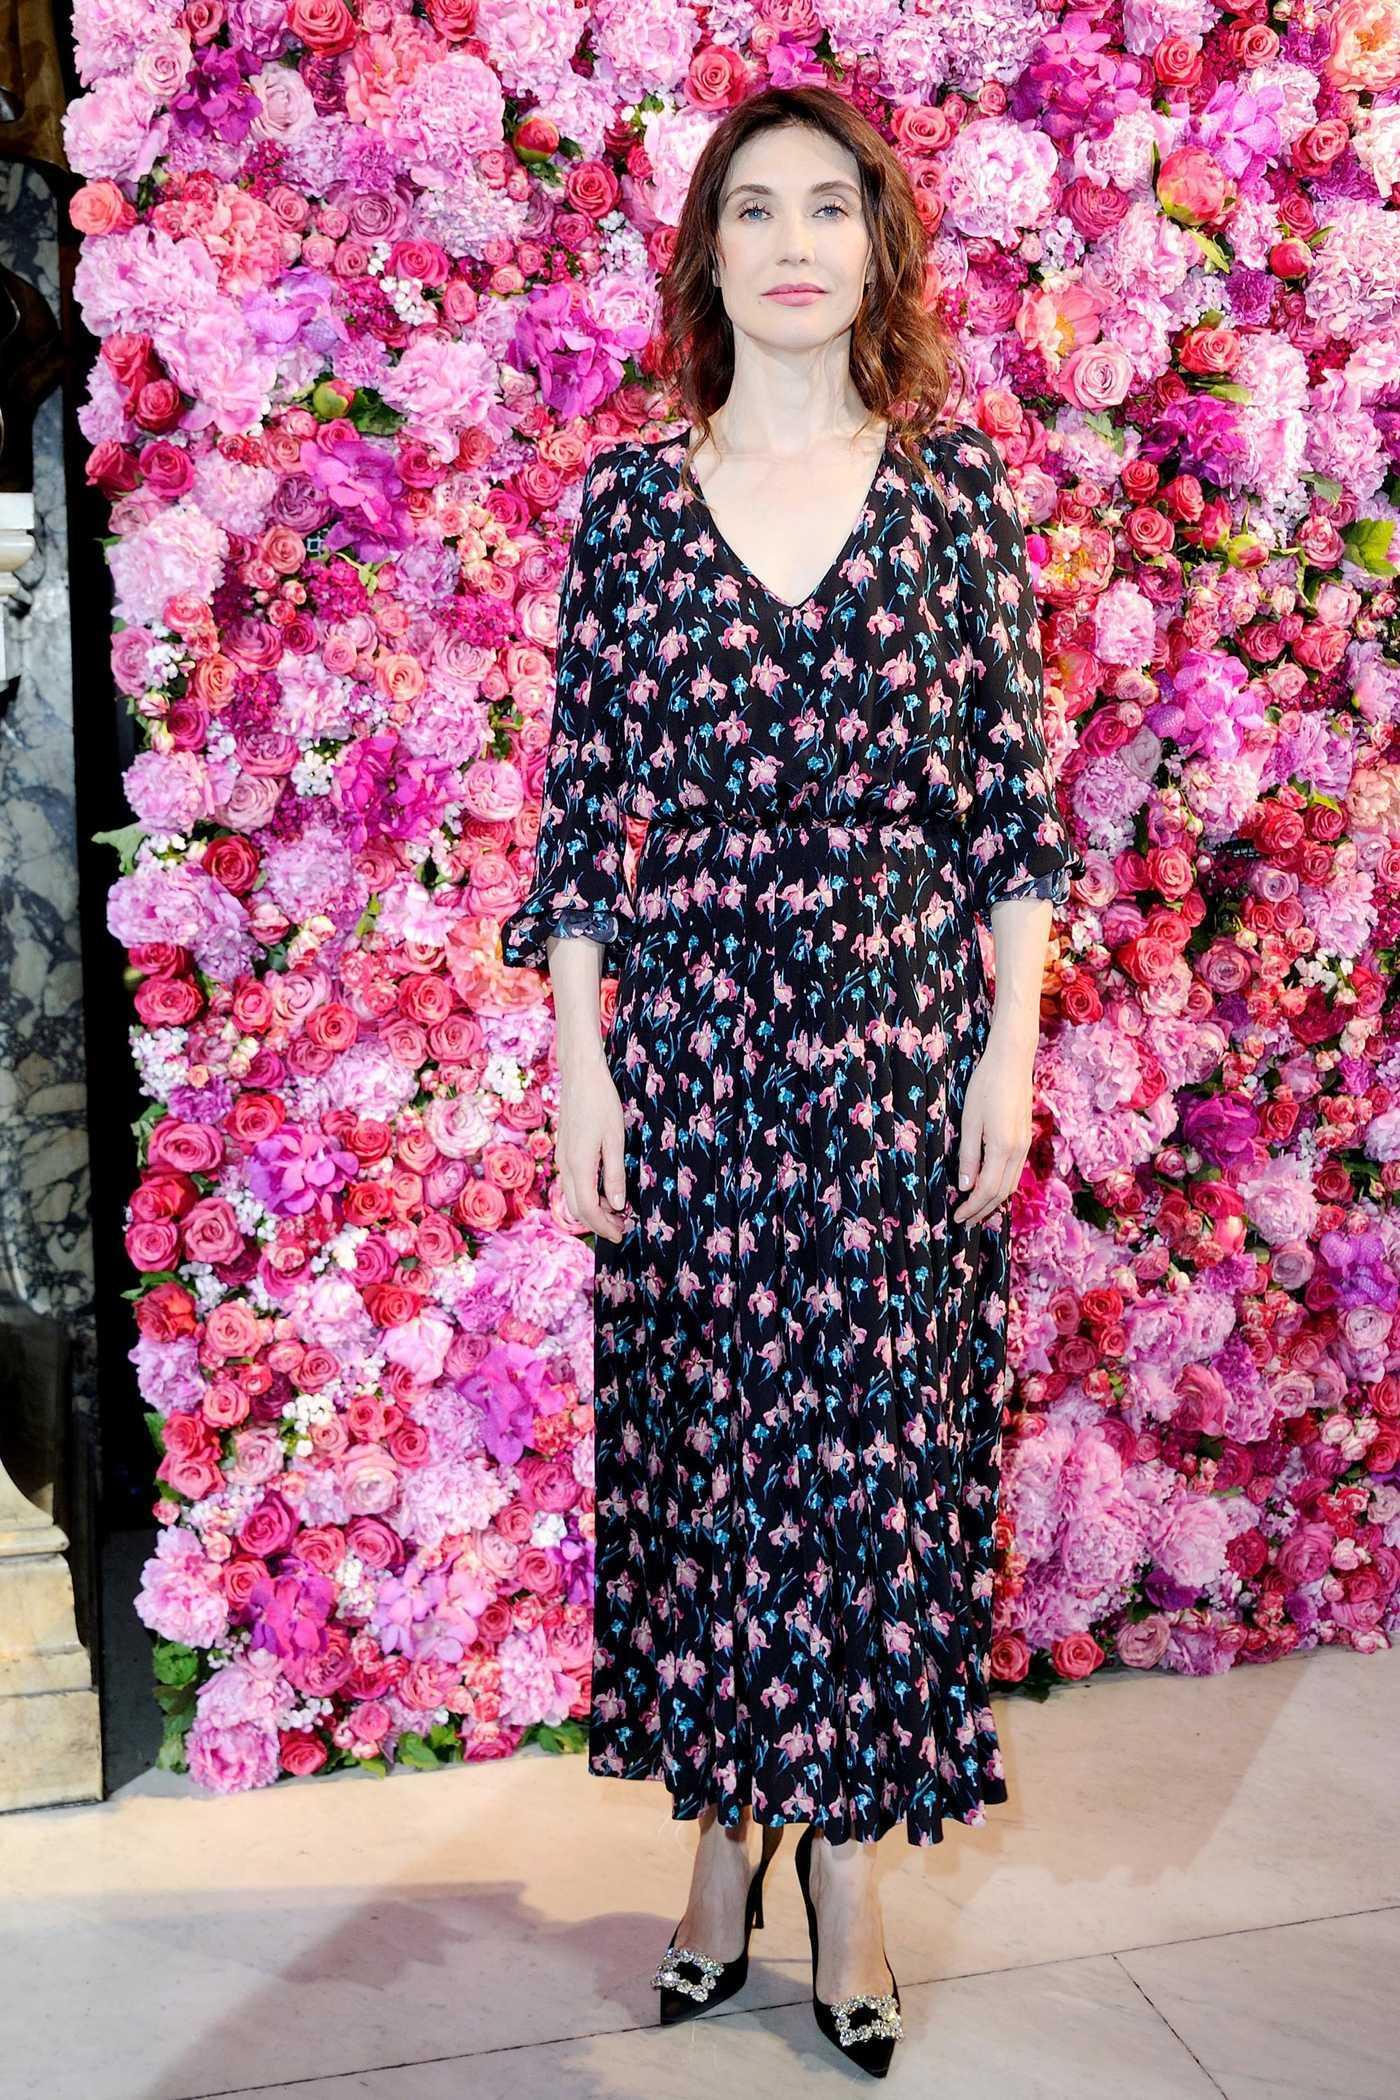 Carice Van Houten Attends 2018 Schiaparelli Haute Couture Fall Winter Show in Paris 07/02/2018